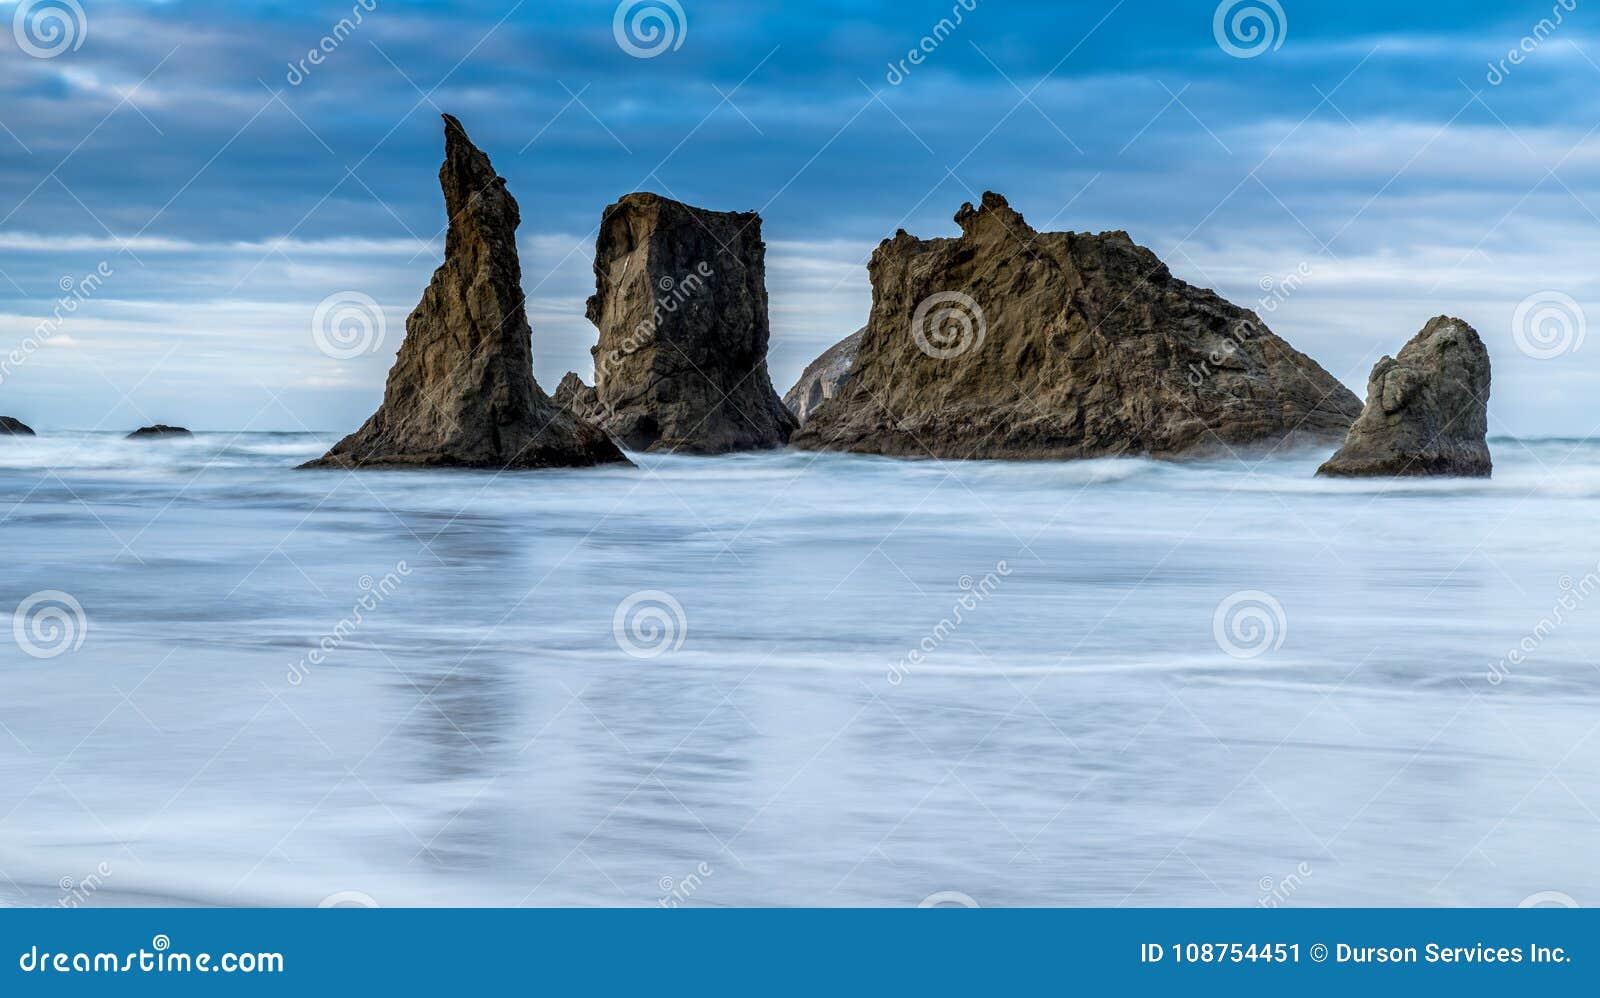 dramatic ocean scene in bandon oregon stock image image of